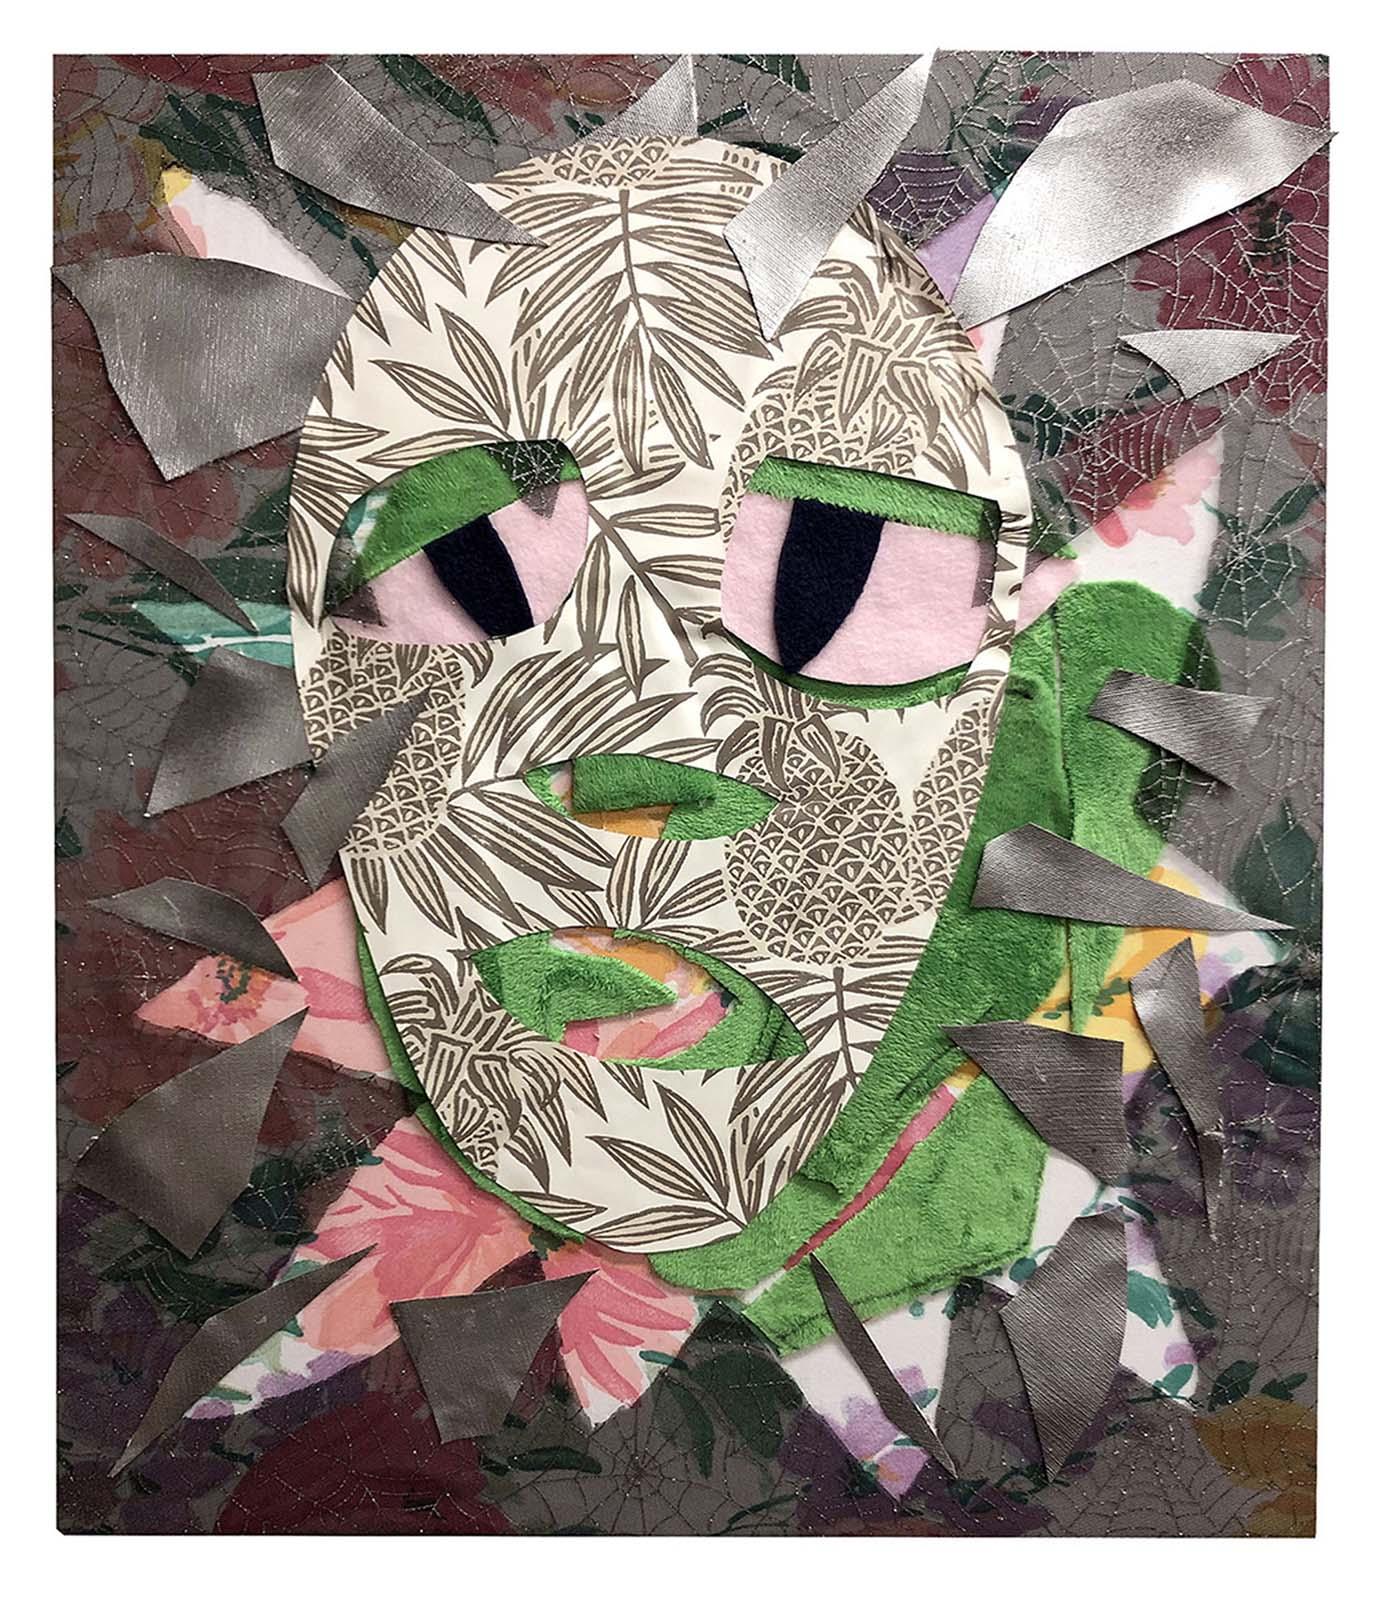 Chris Williford, Tropical Sheet Mask (2019) Fleece, vinyl, enamel, tulle, and printed cotton on canvas